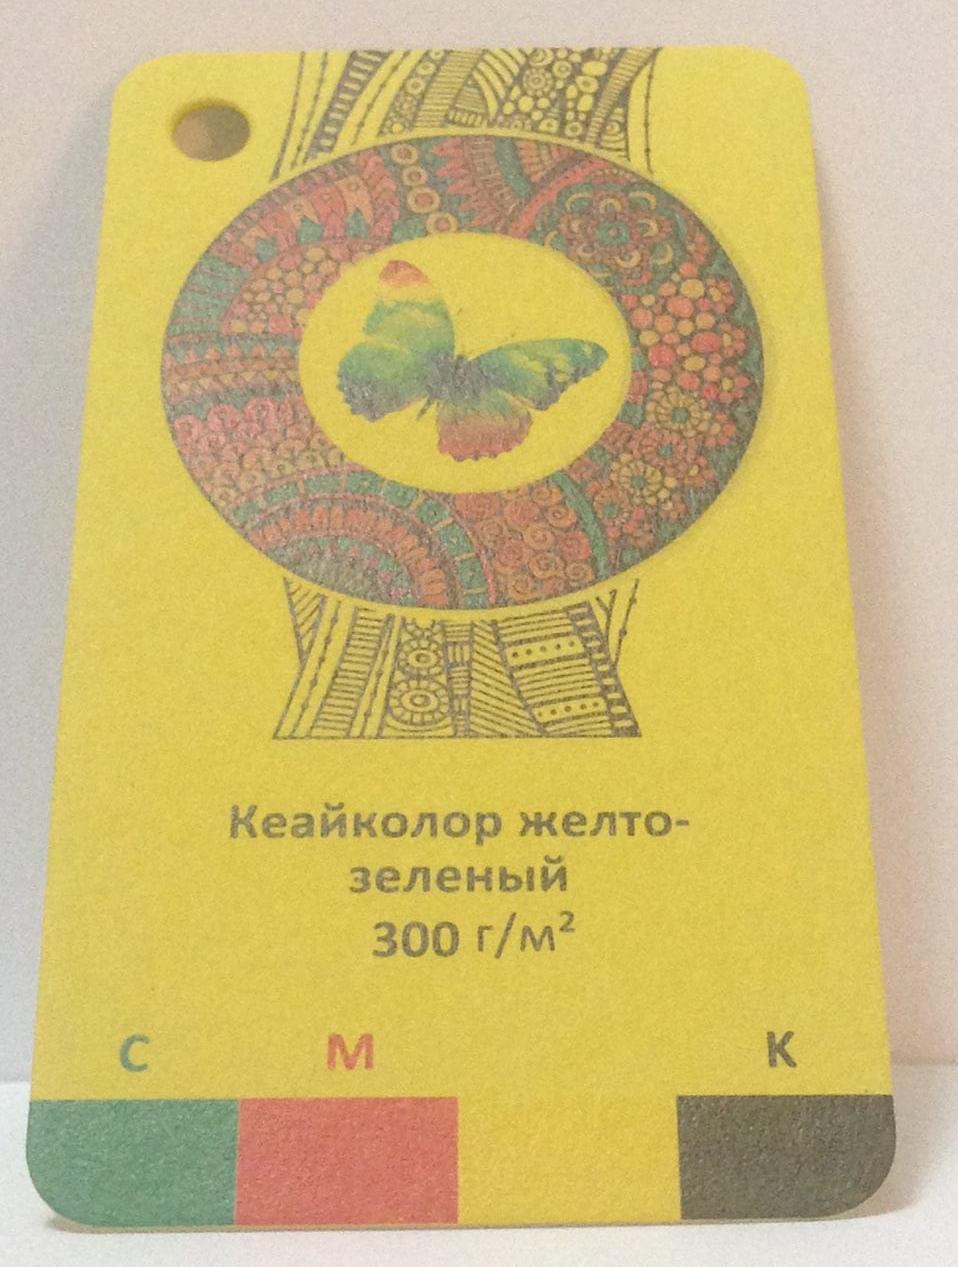 Кеайколор желто-зеленый